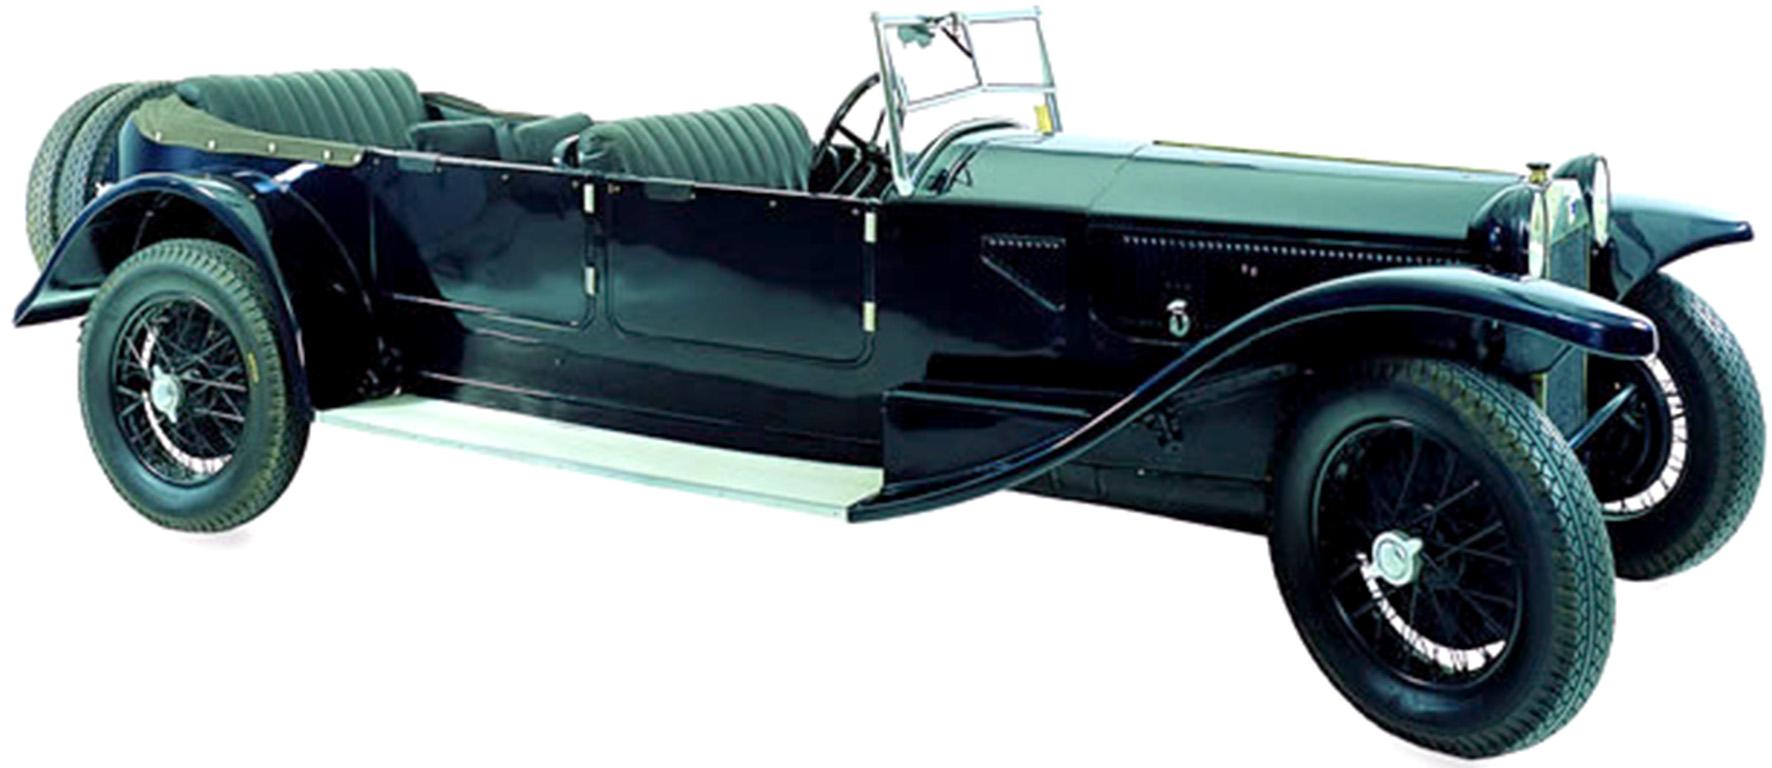 La Lancia 'Lambda' (IX serie) torpedo, 1930, foto © aut./MAUTO